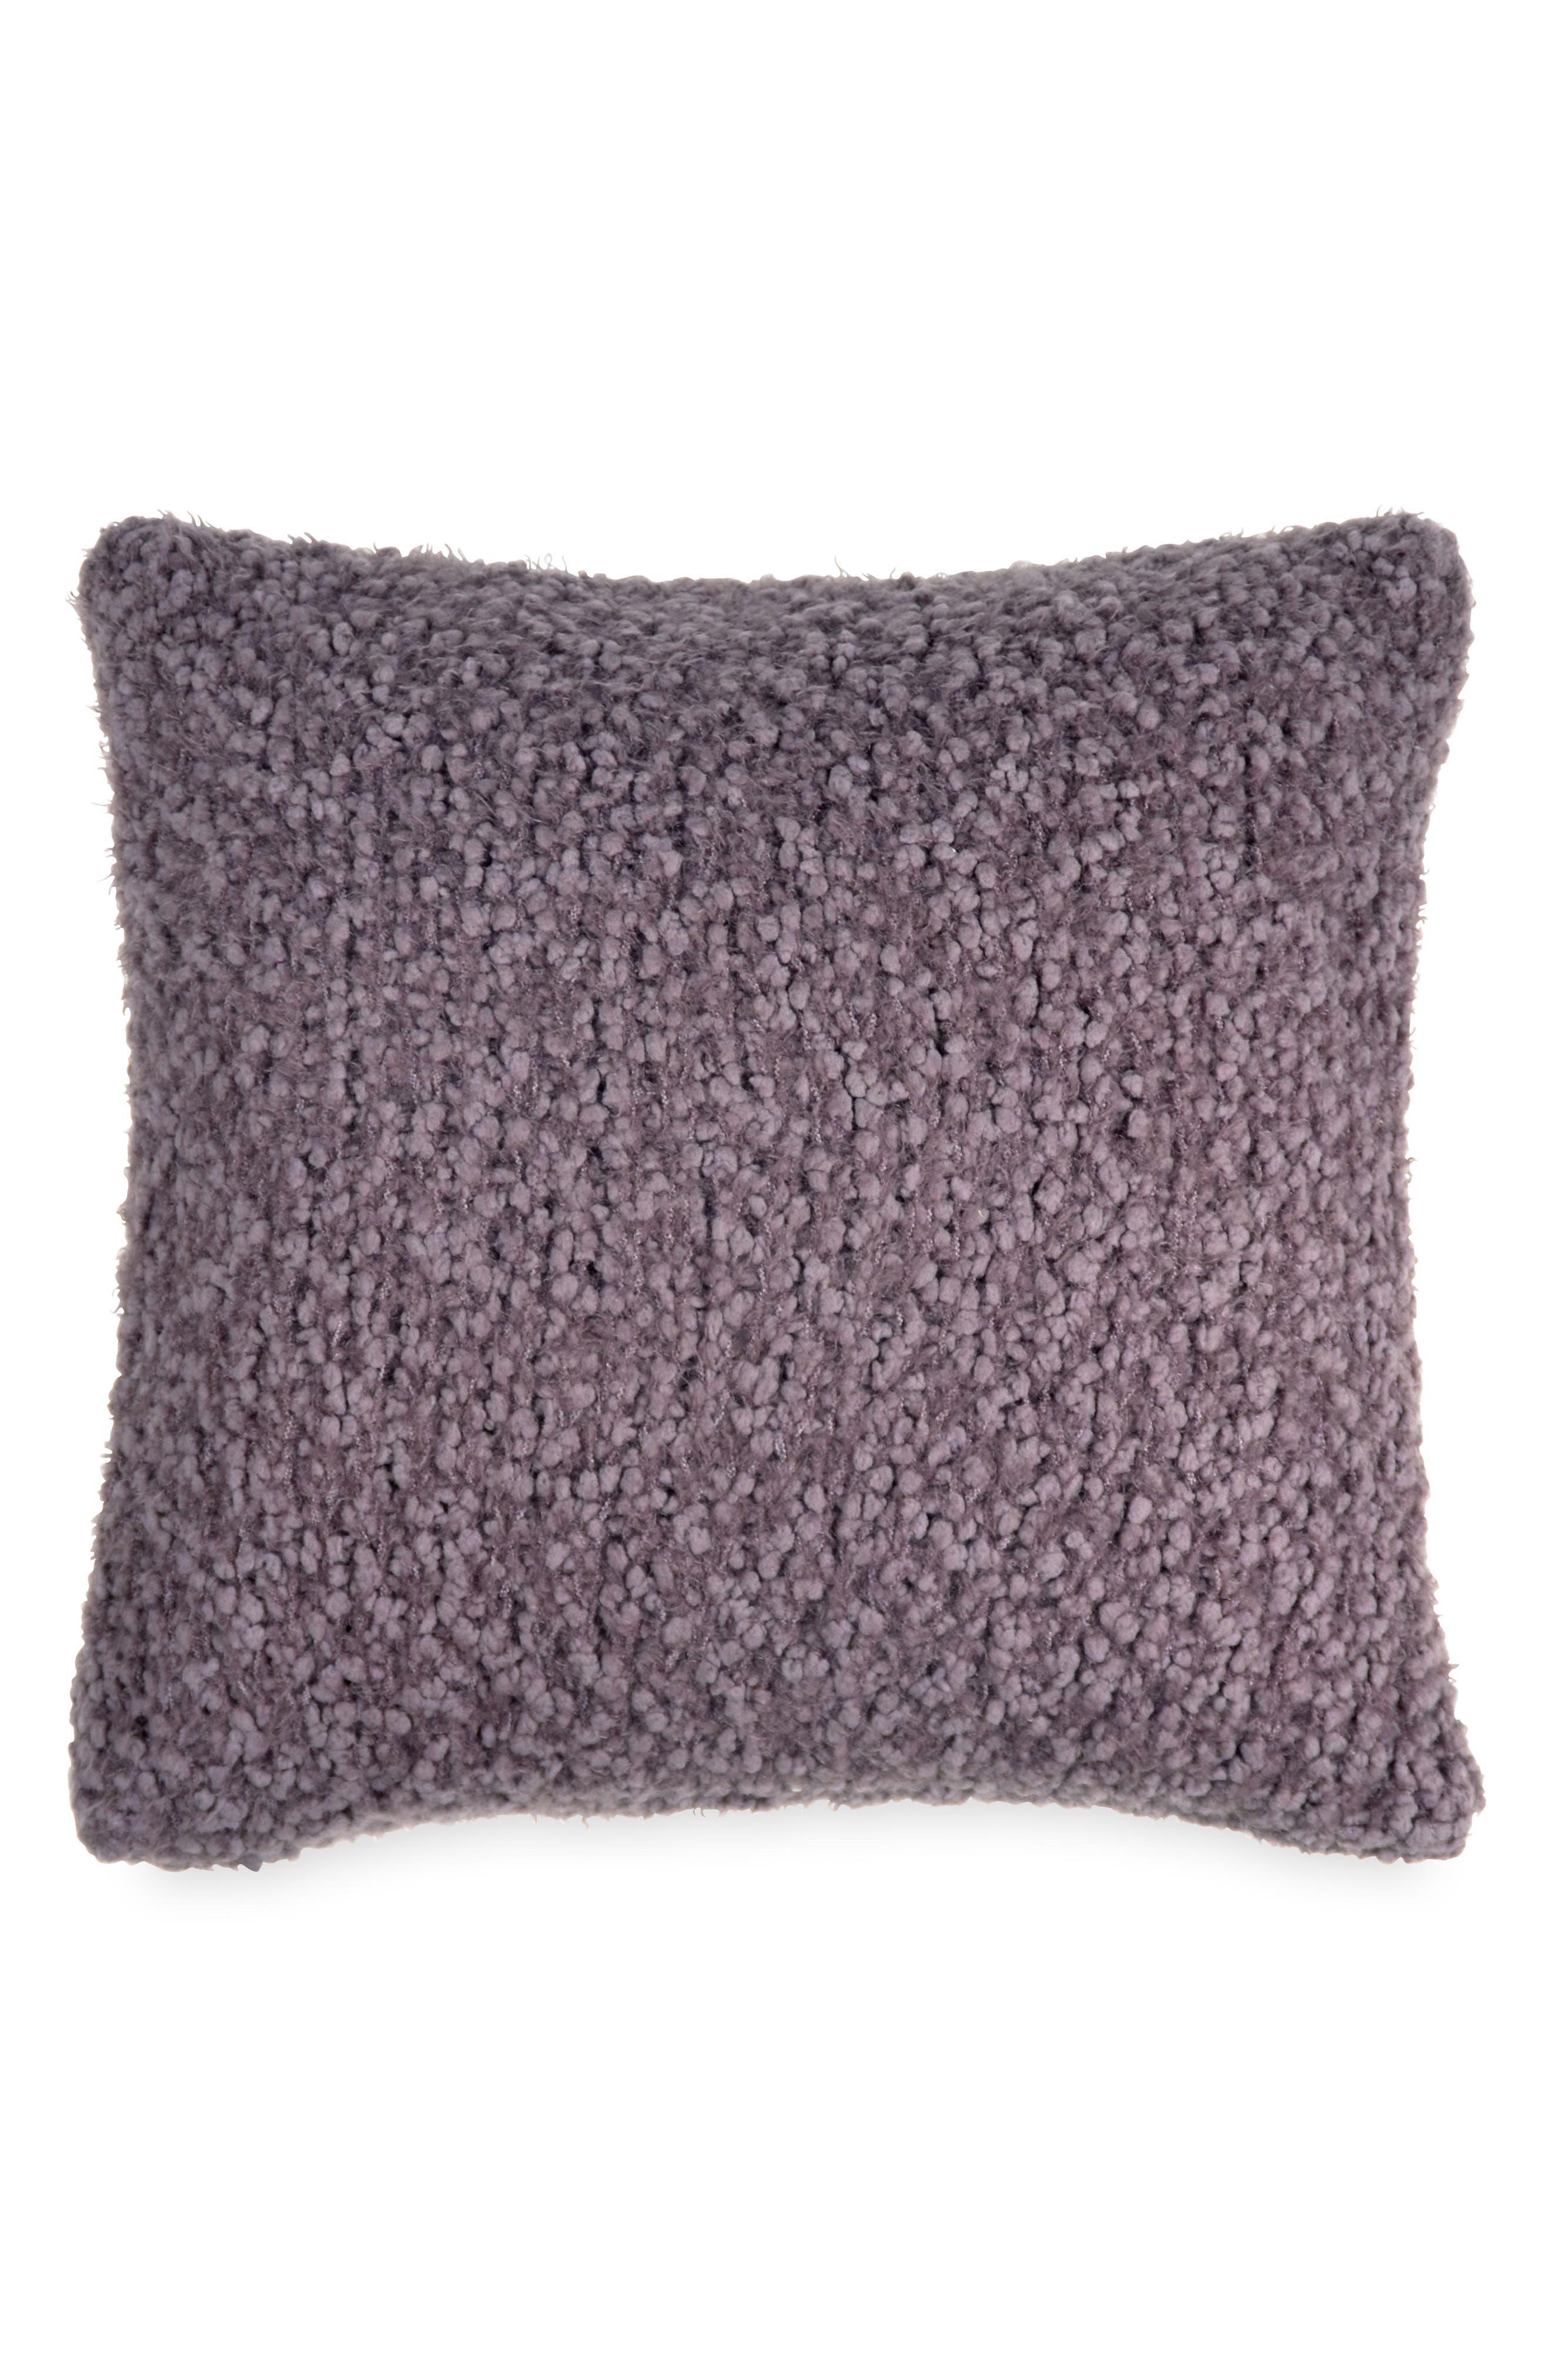 X Factor Knit Accent Pillow,                             Main thumbnail 1, color,                             500